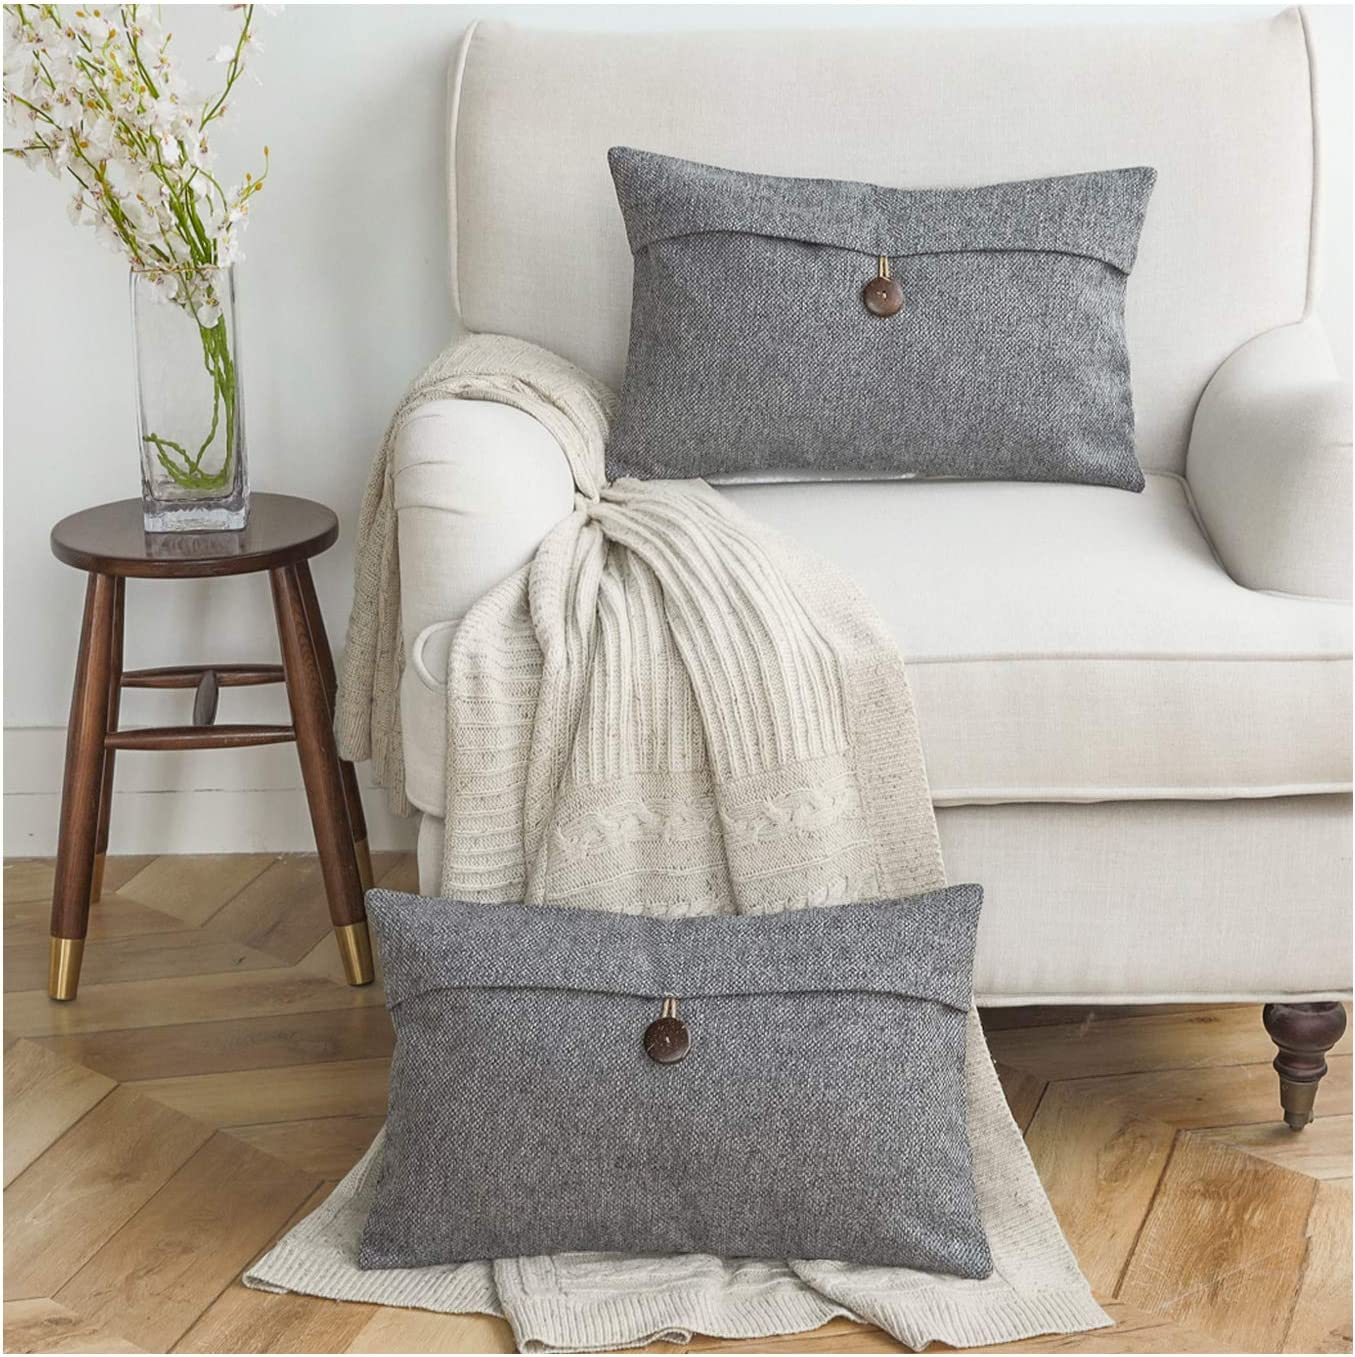 Azume Dark Grey Throw Pillow Couch Line for Covers Popular popular Pillows Regular dealer